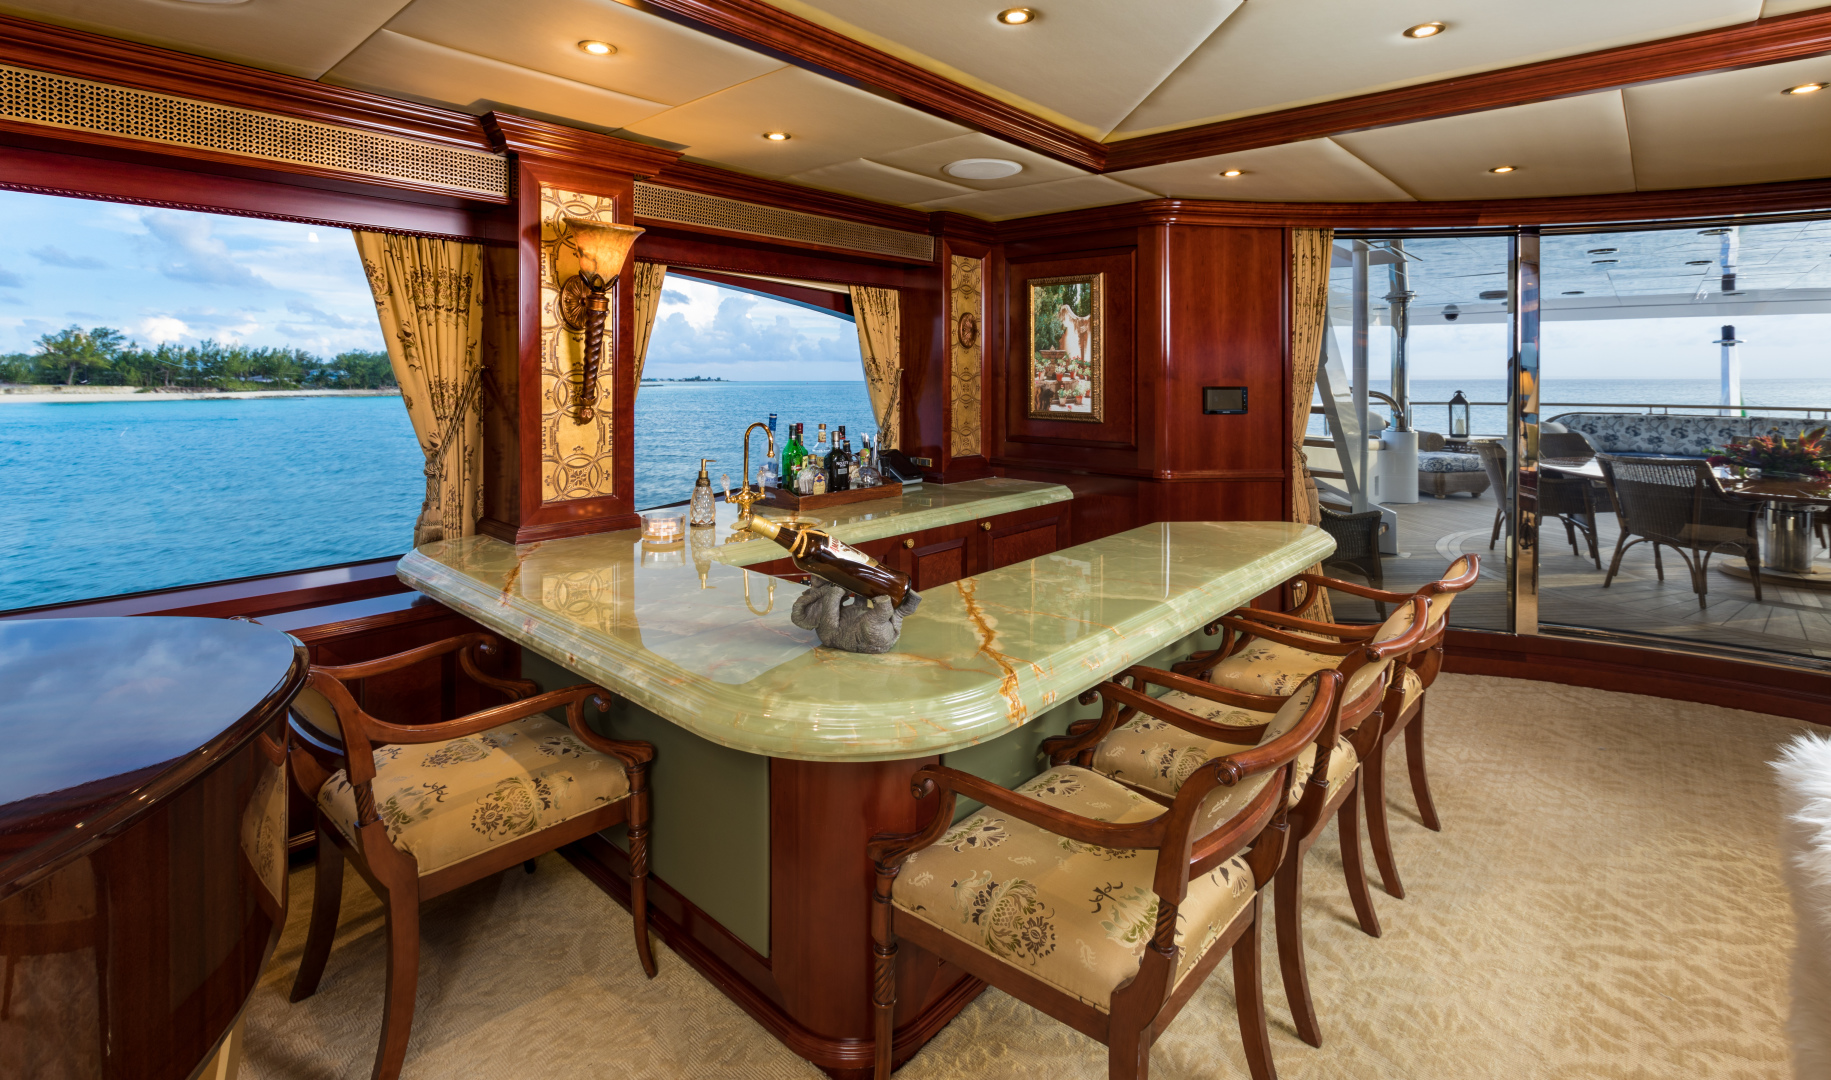 Trinity Yachts-164 Tri-deck Motor Yacht 2008-Amarula Sun Fort Lauderdale-Florida-United States-Skylounge Bar-1513951 | Thumbnail